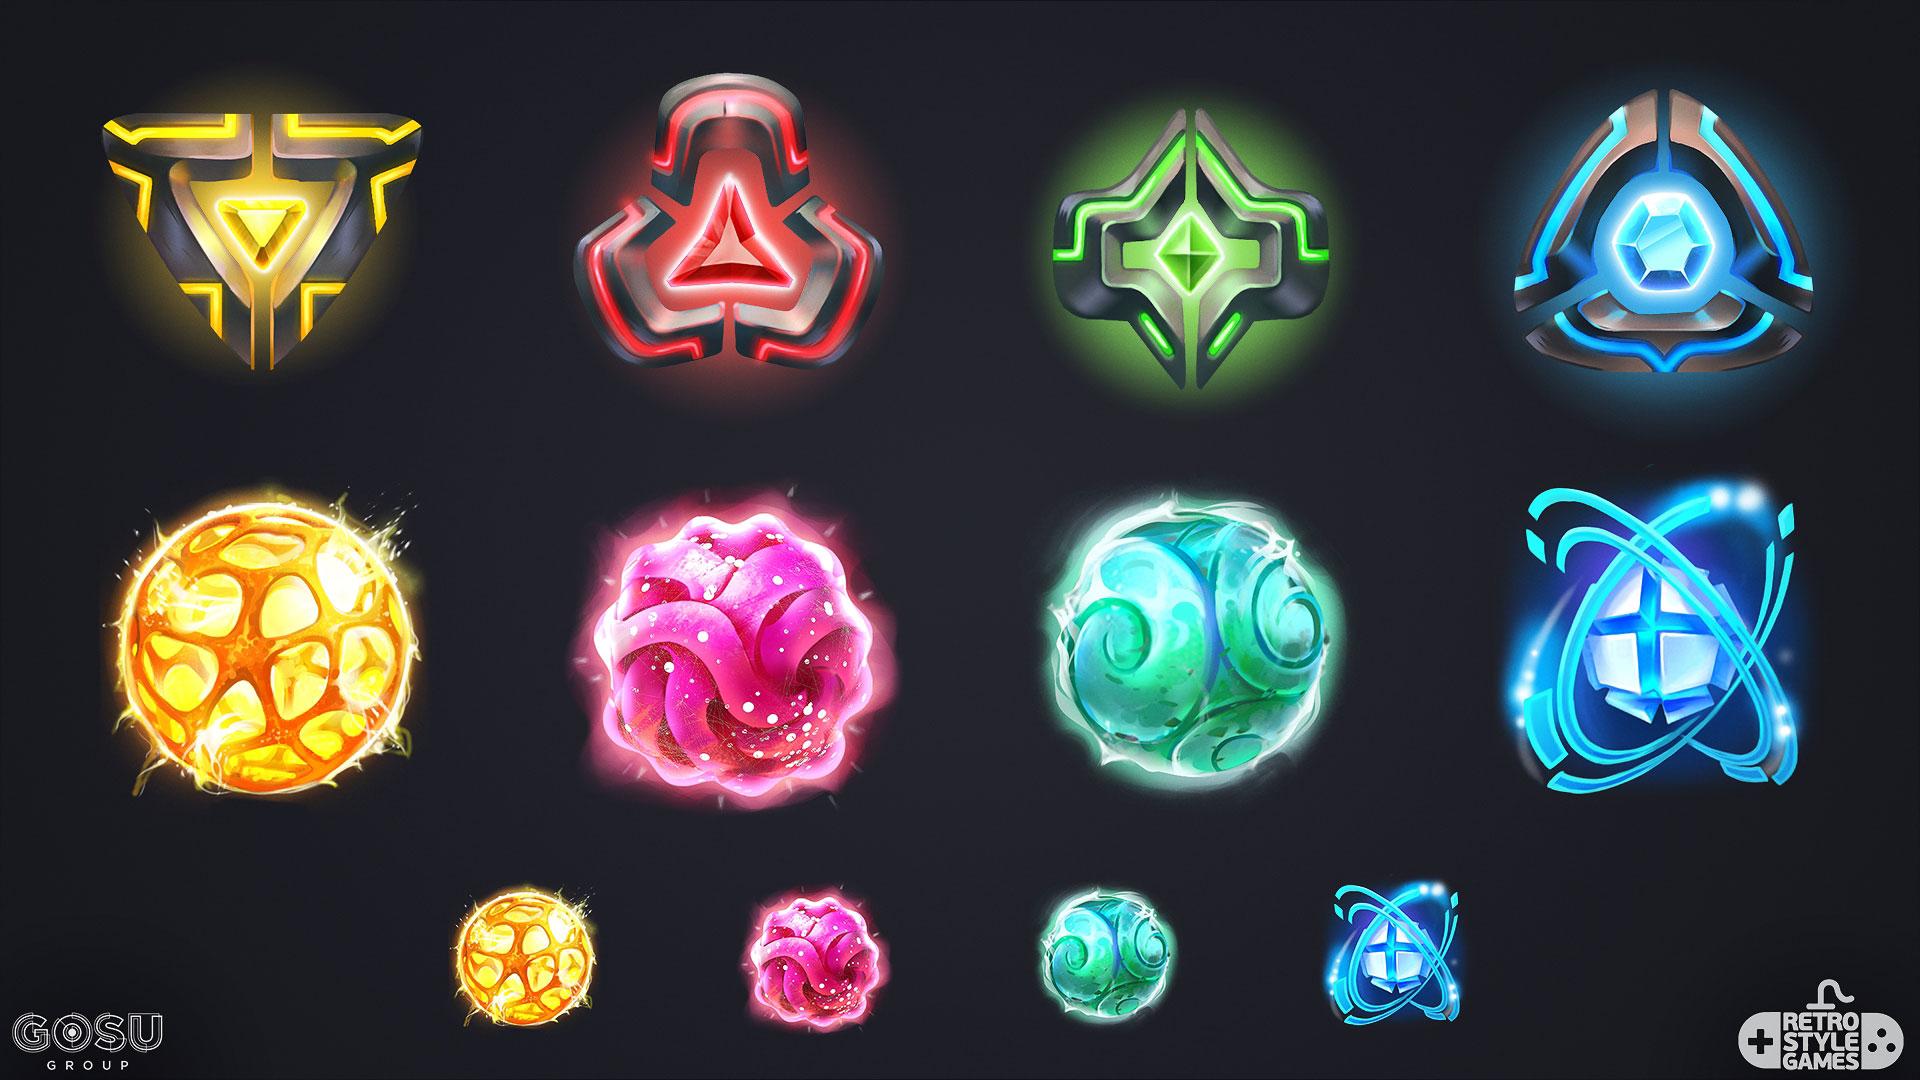 chrono strike 2d sci-fi energy fx sphere fire diamond